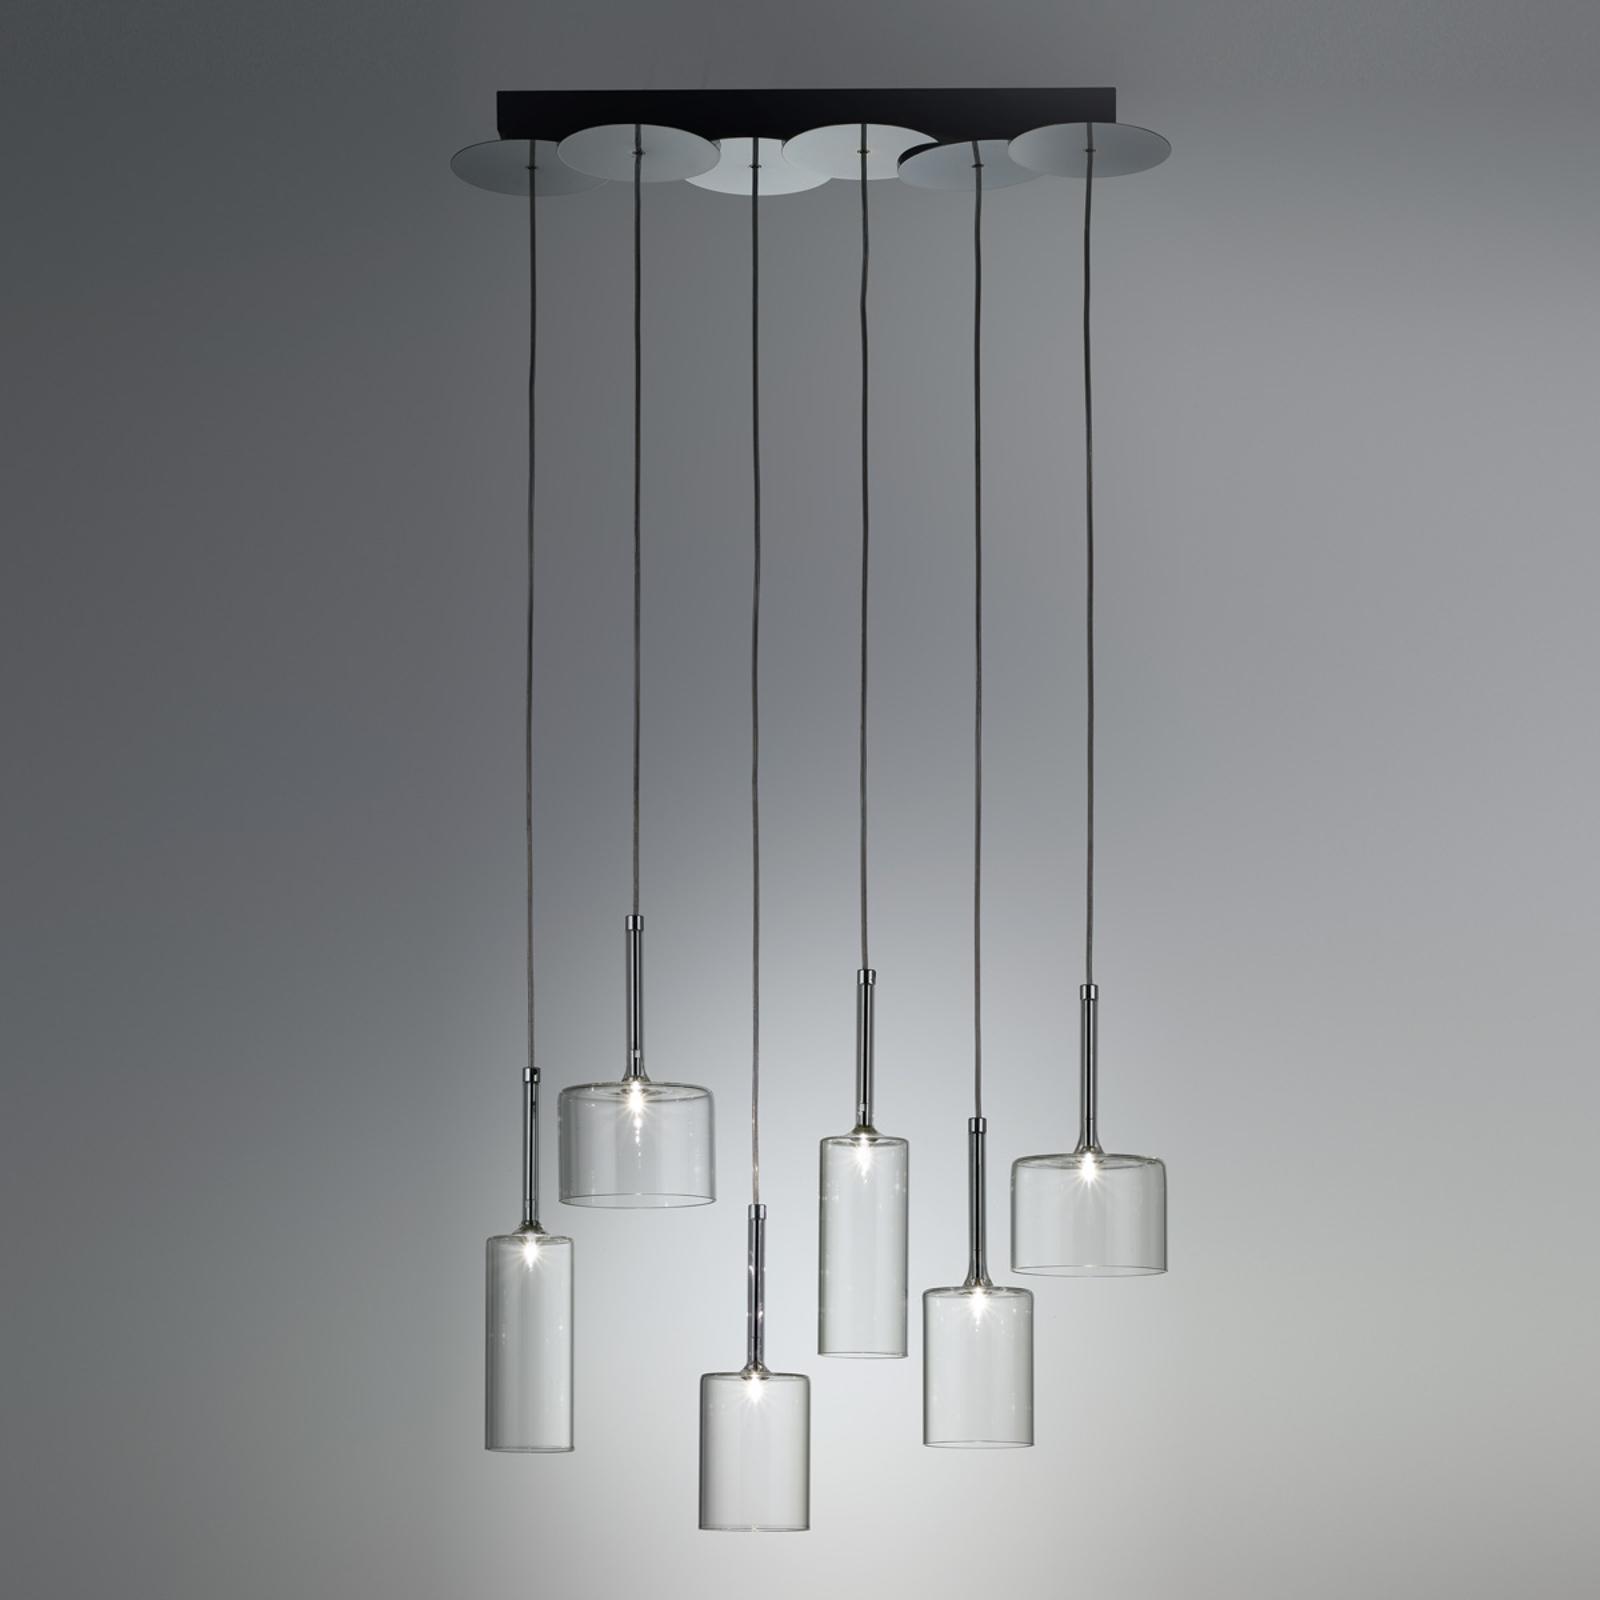 Six-bulb glass hanging light Spillray_1088088_1